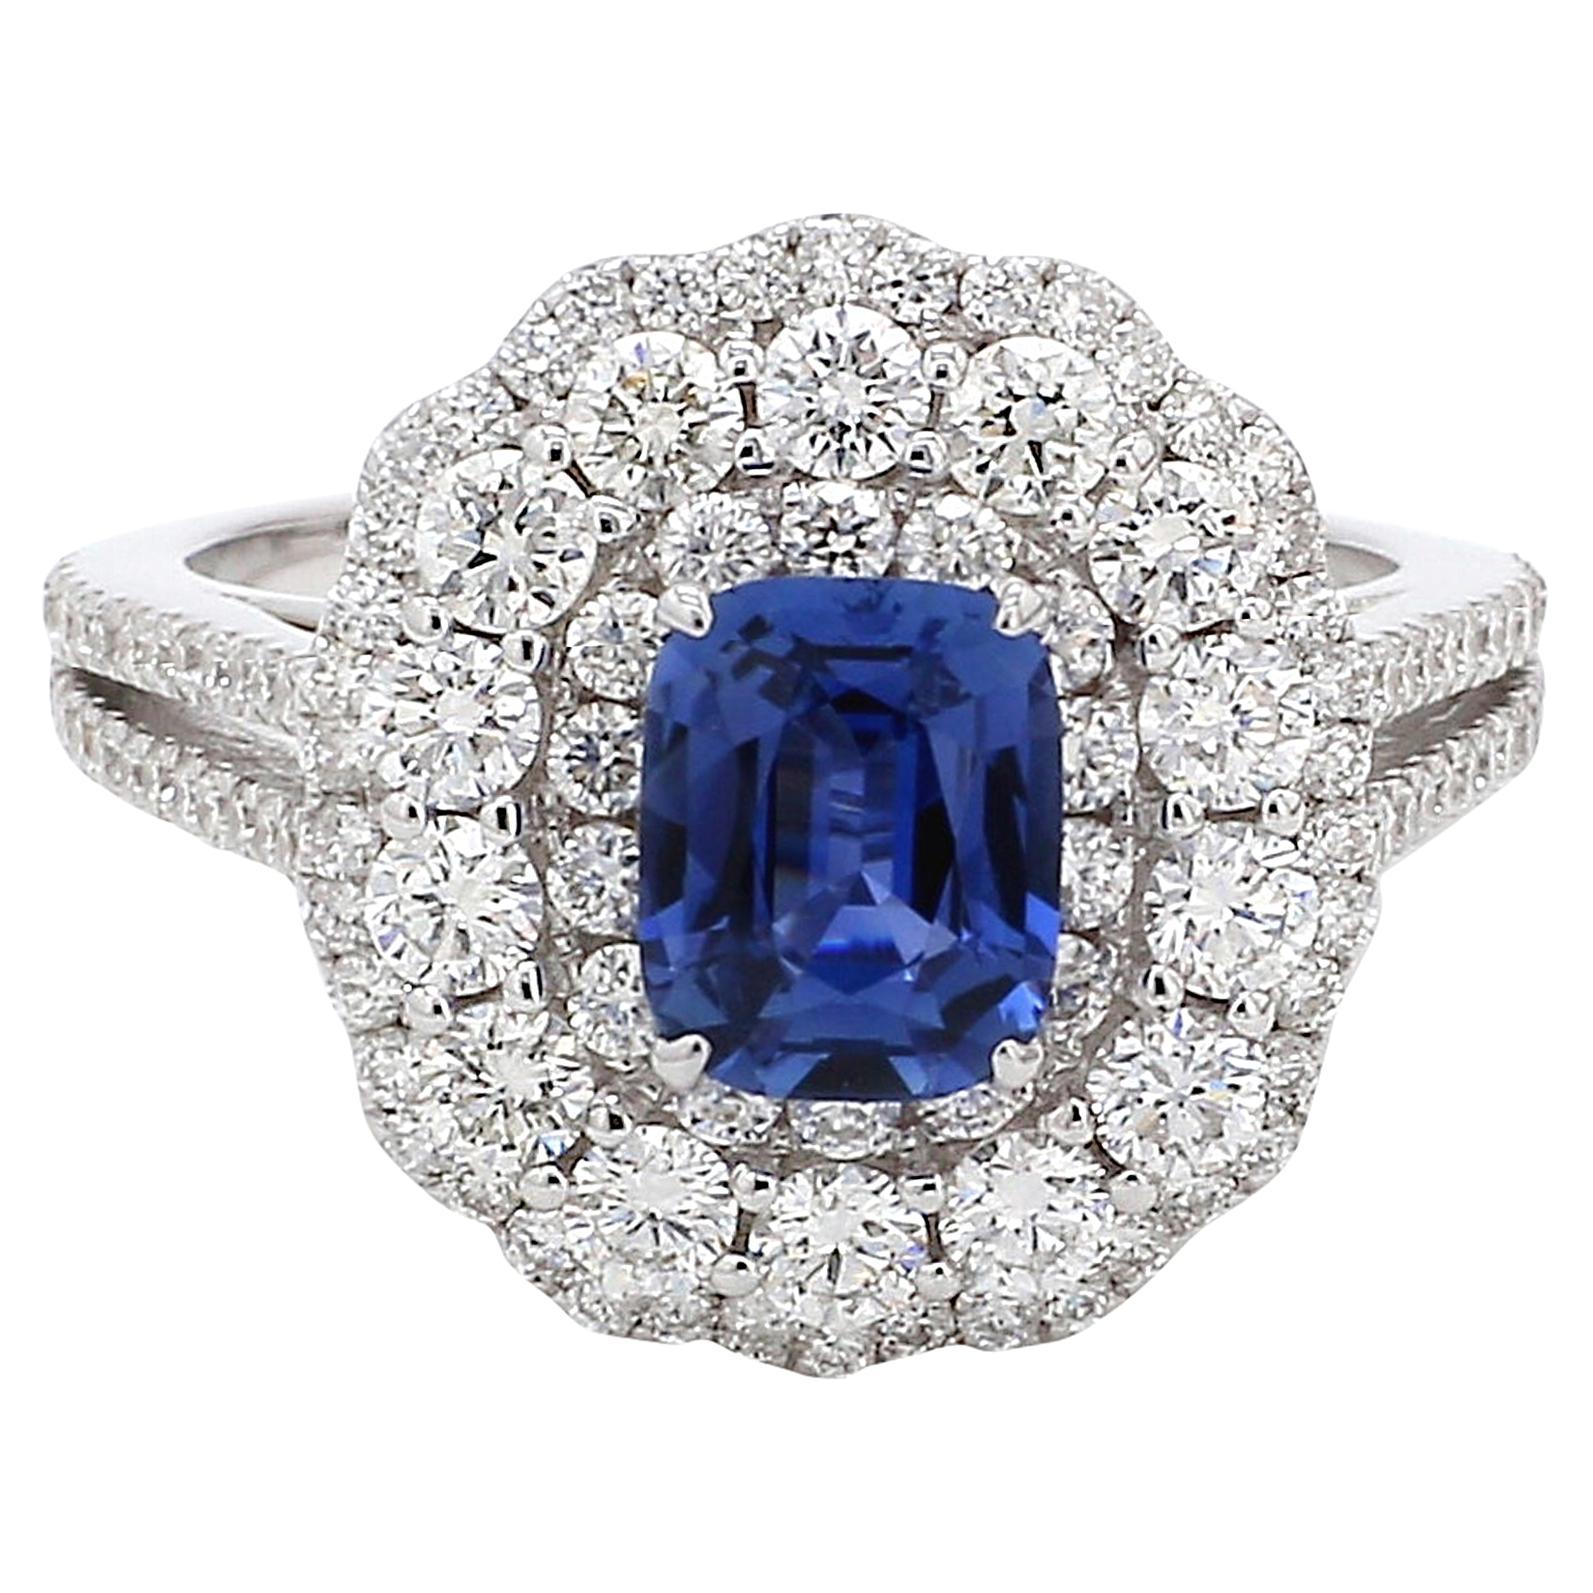 GRS Certified Natural No Heat Blue Sapphire Diamond 18 Karat White Gold Ring